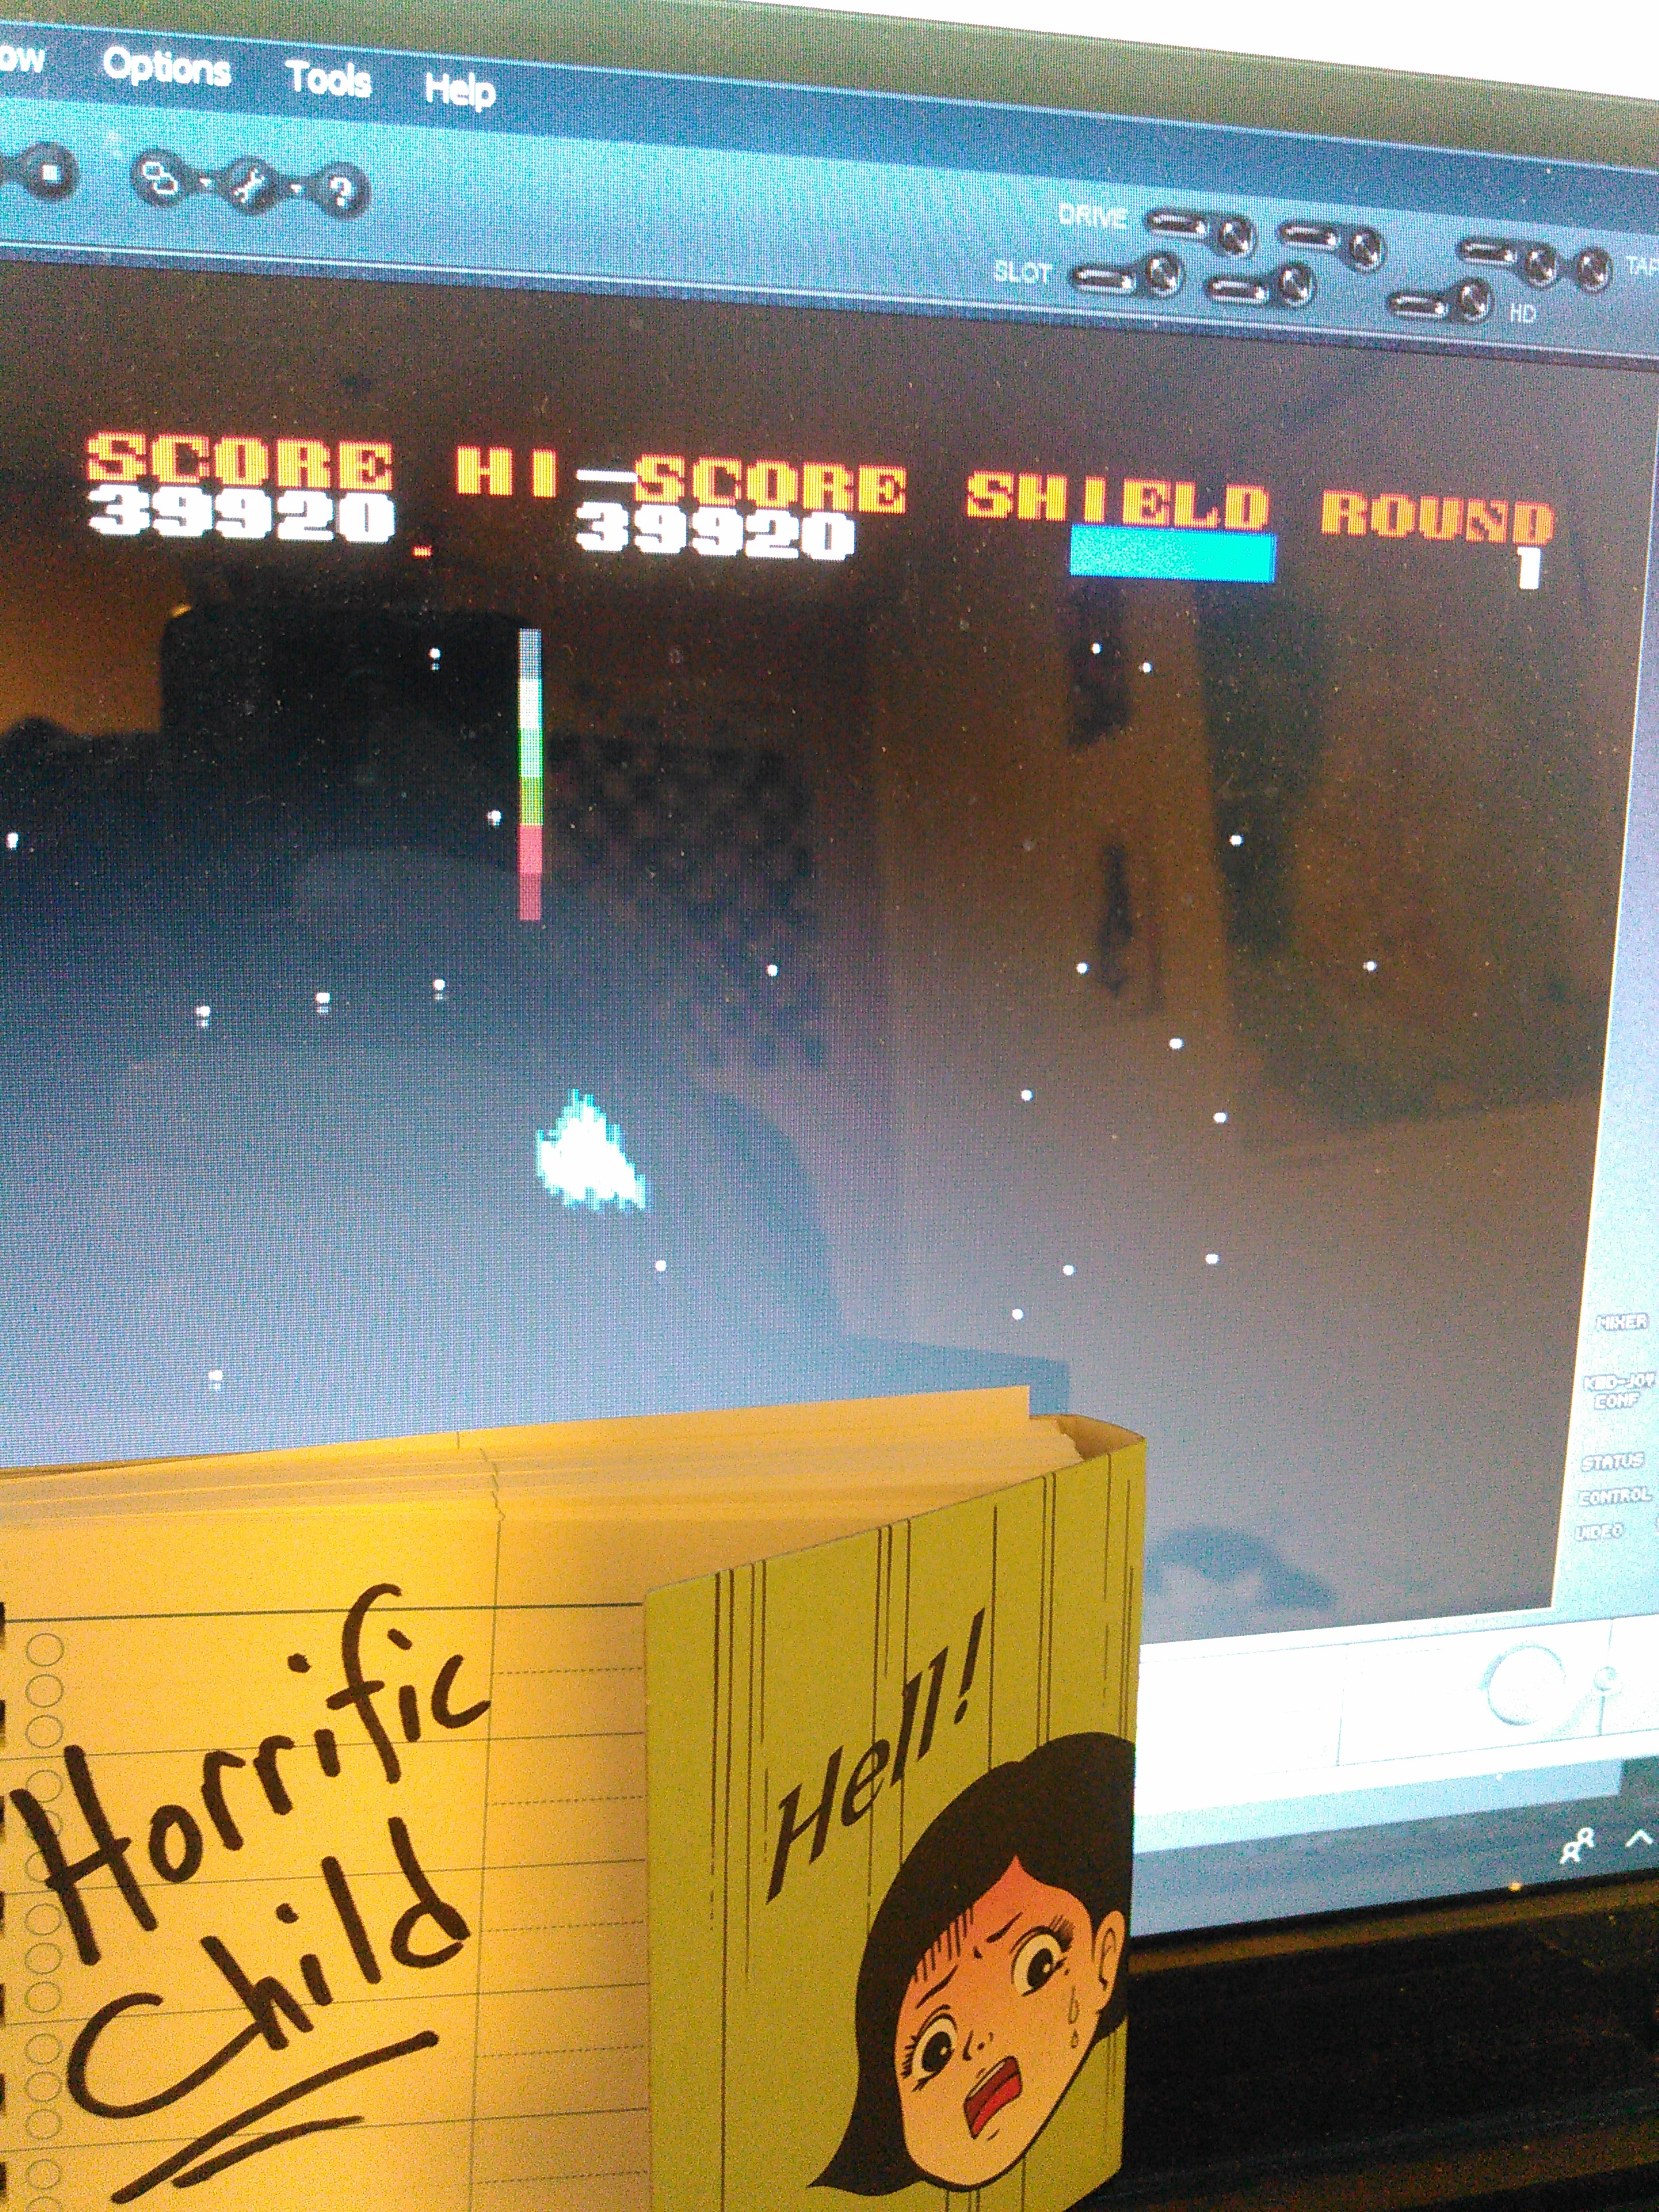 HorrificChild: Final Justice (MSX Emulated) 39,920 points on 2018-01-29 02:56:20